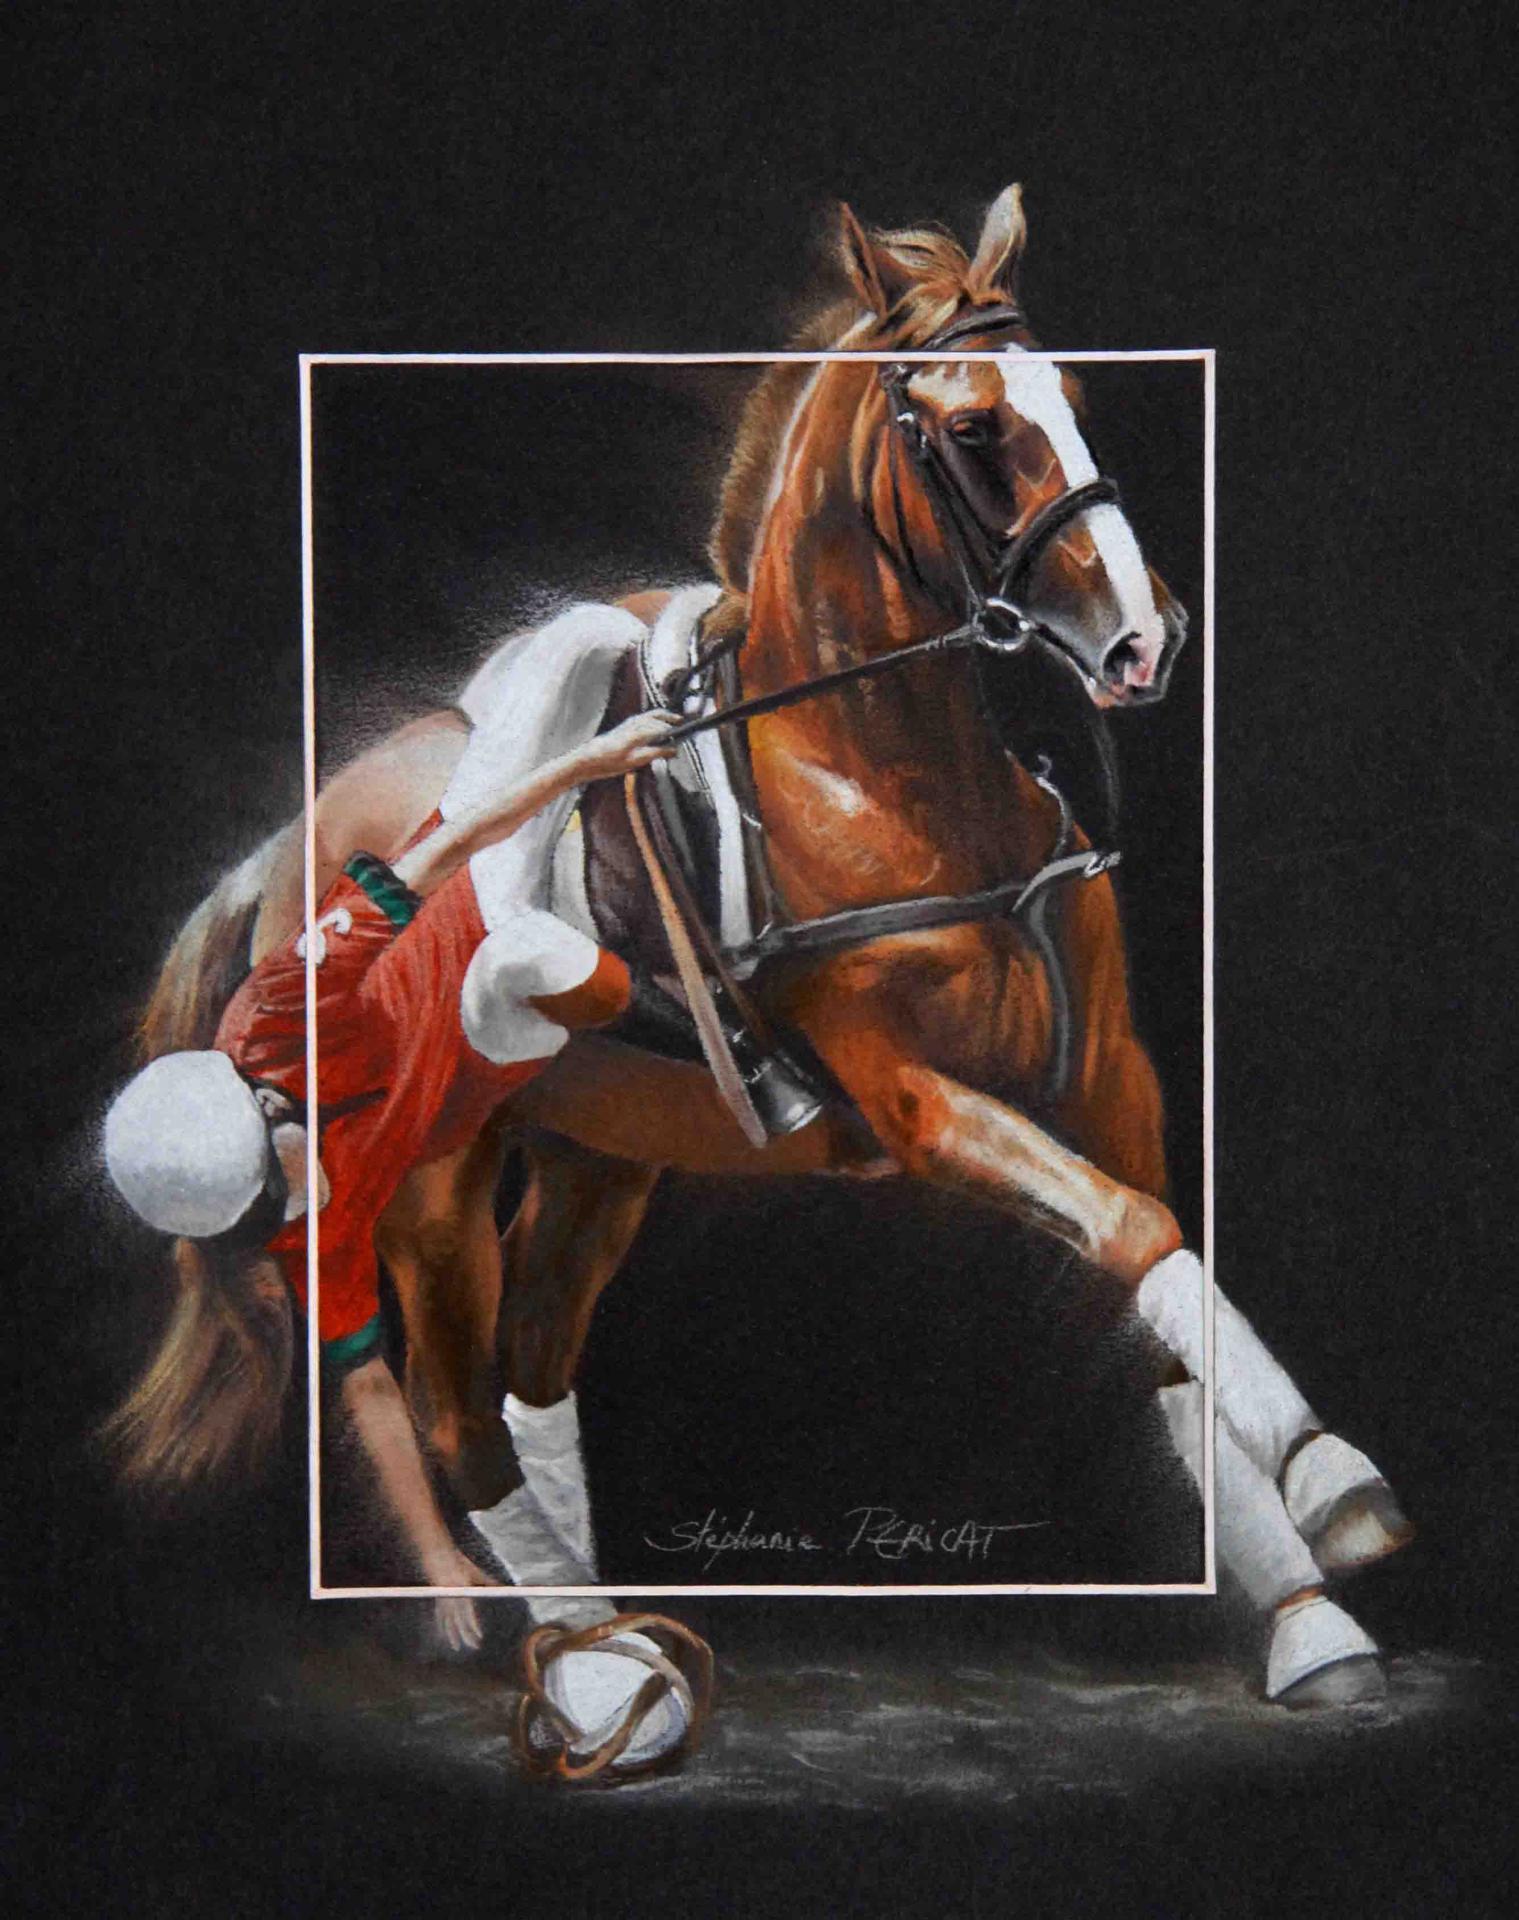 HORSE-BALL RAMASSAGE PORTUGAIS (portuguese) -  24x30cm